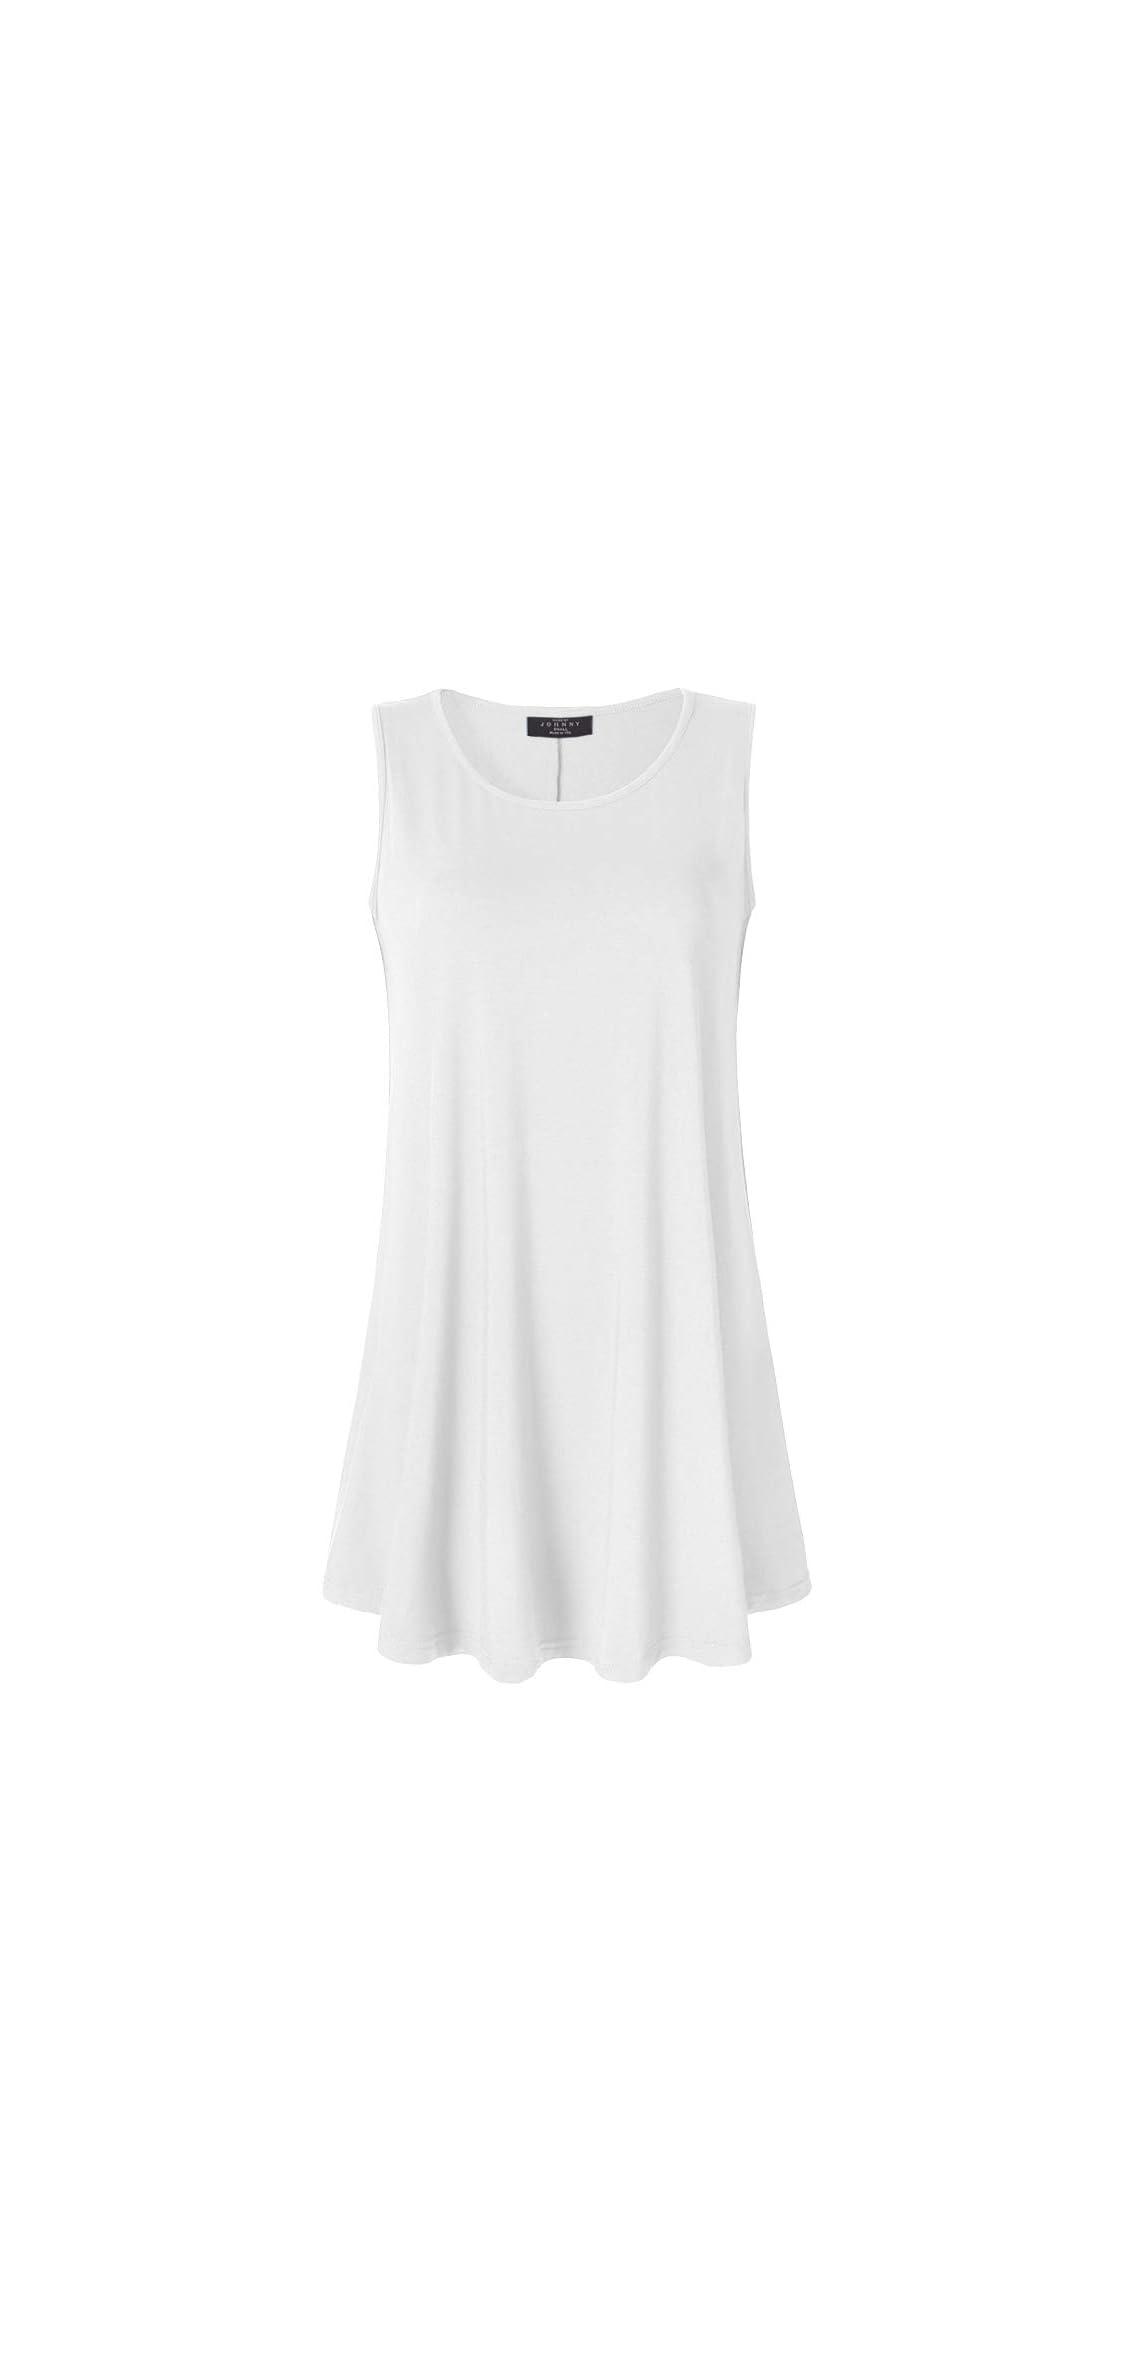 Women Solid Short Sleeve/sleeveless Tunic For Tank